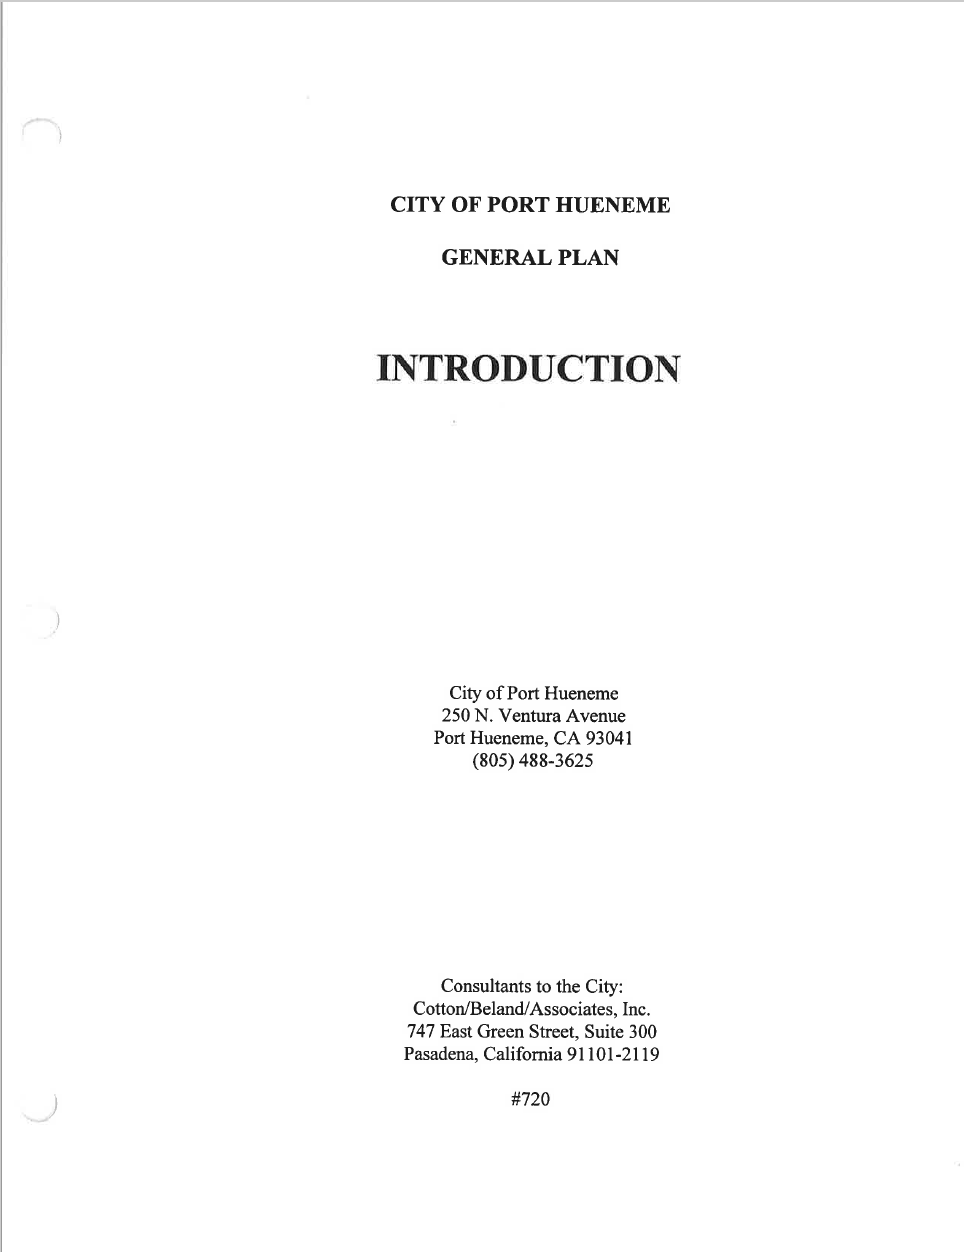 General Plan Info.png